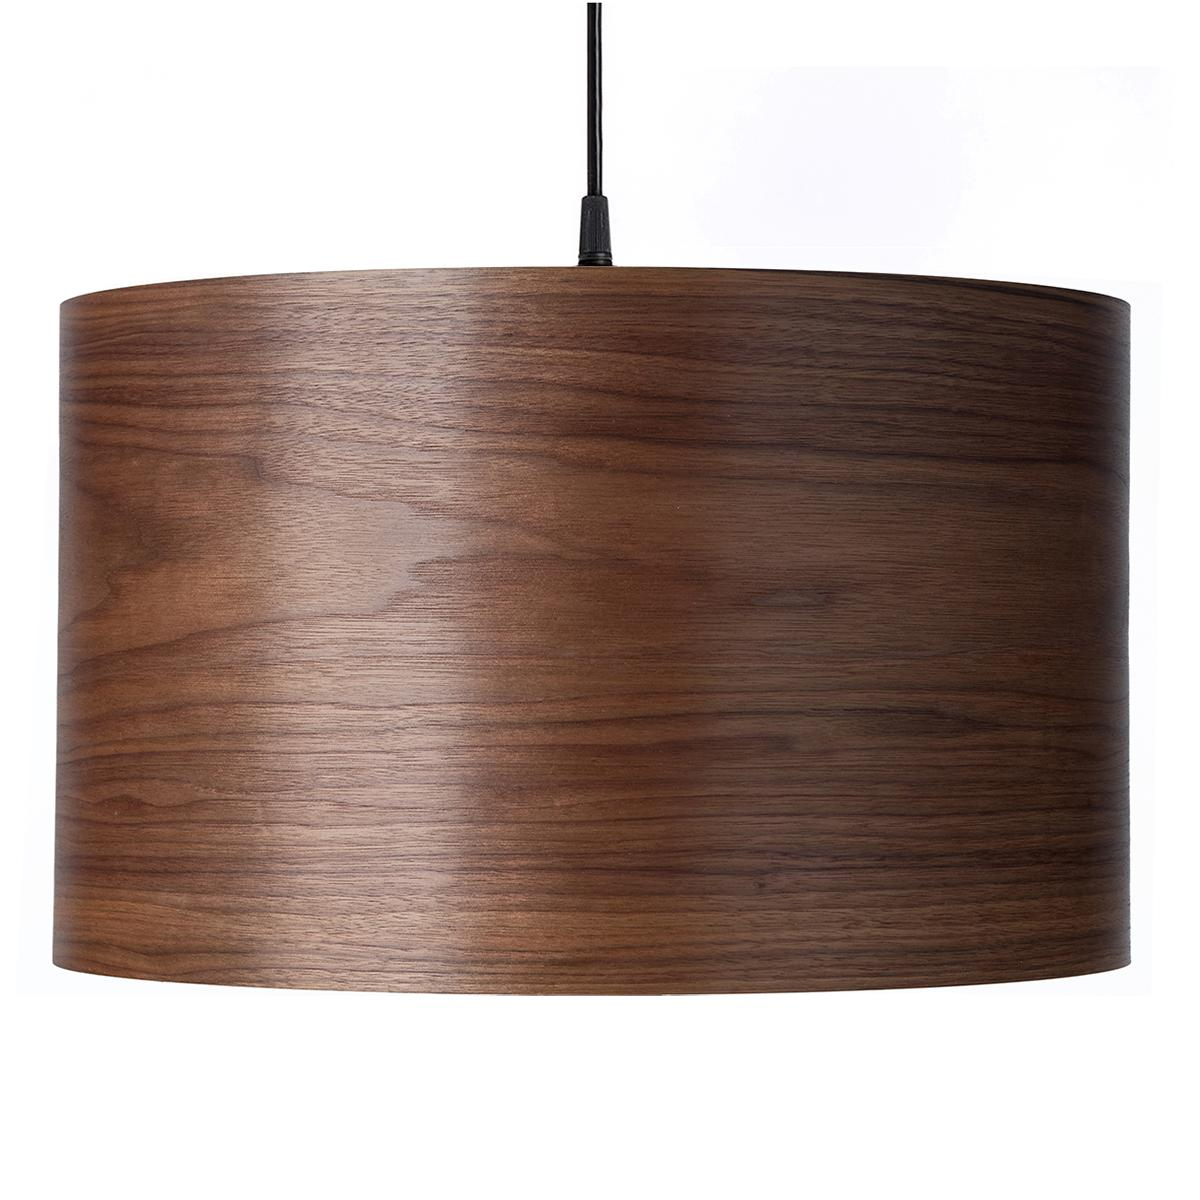 ARA Walnut Wood Drum Chandelier Pendant